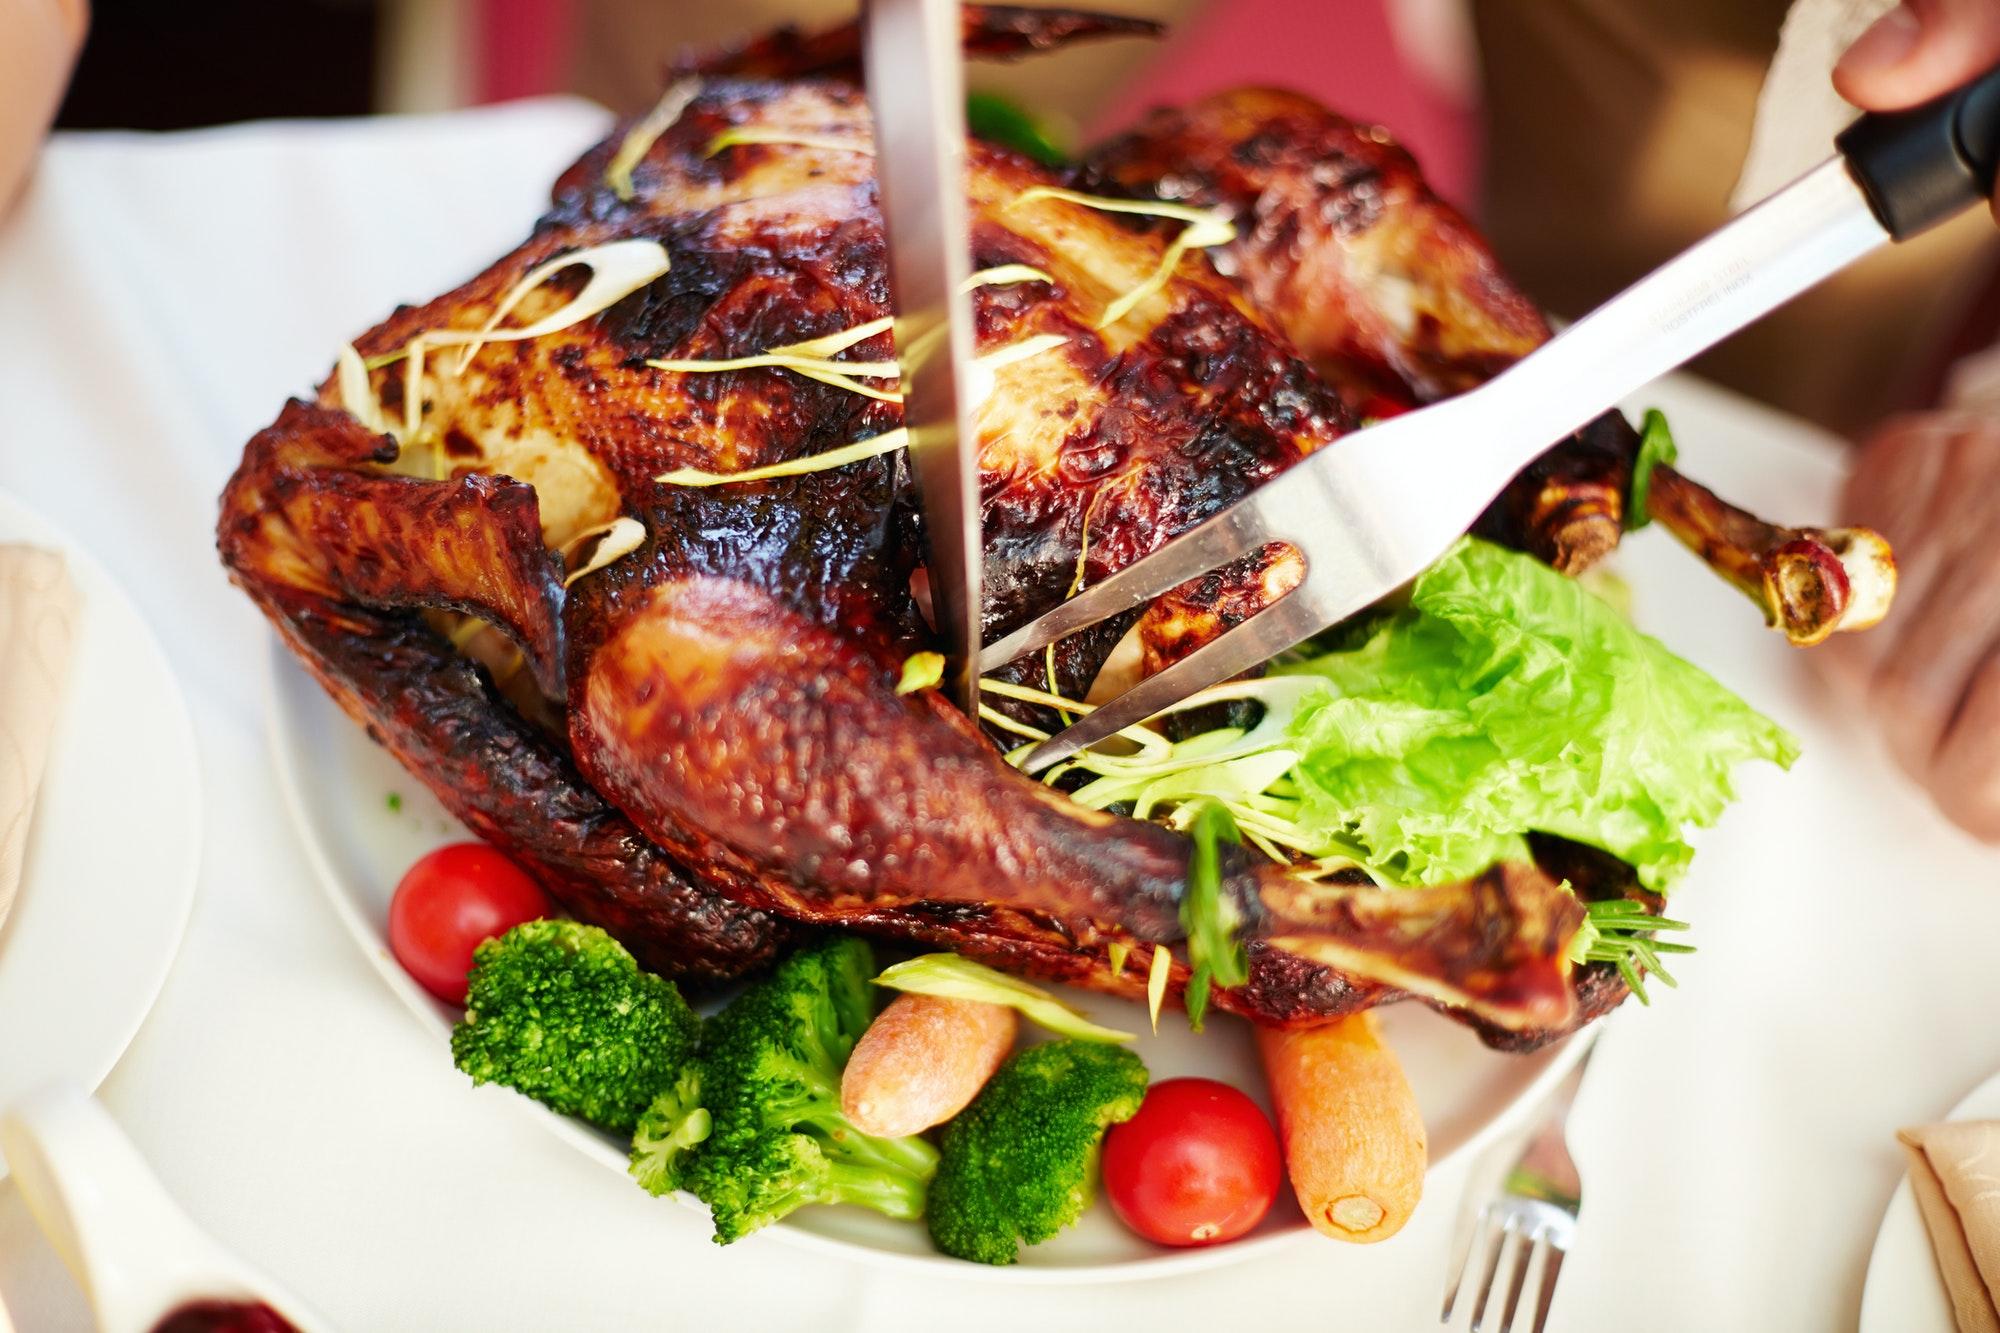 PickFu holiday poll: Cutting meat